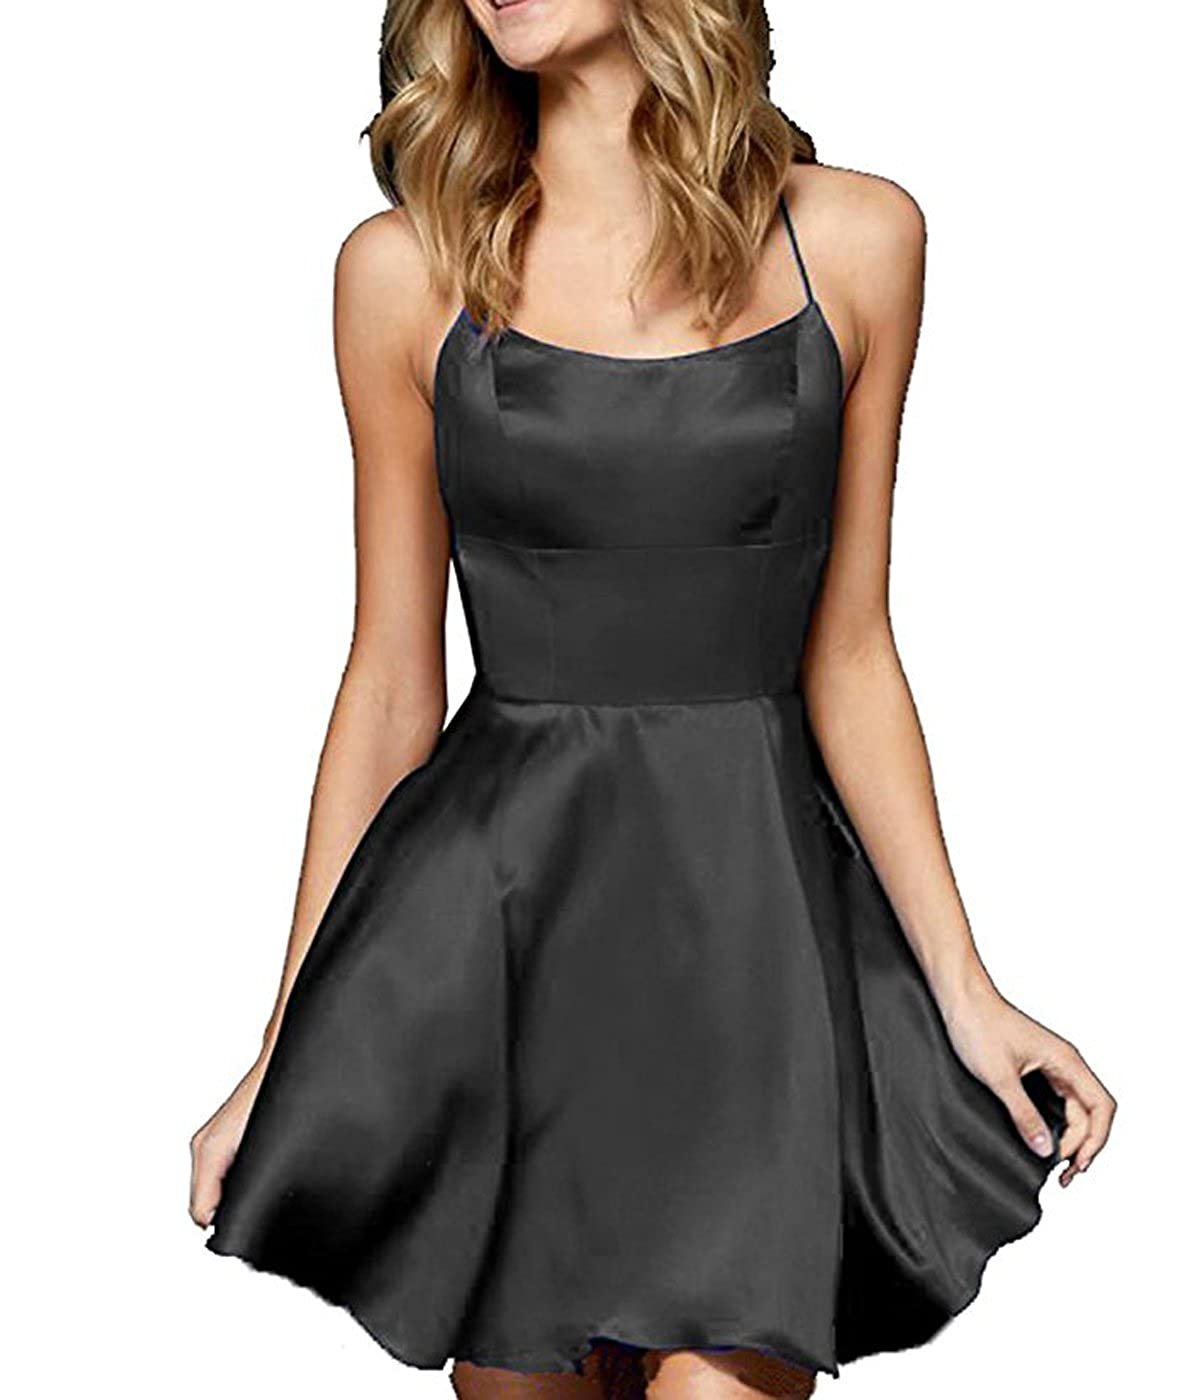 Blacka JQLD Elegant Satin V Neck Backless Short Homecoming Prom Dresses Graduation Girls